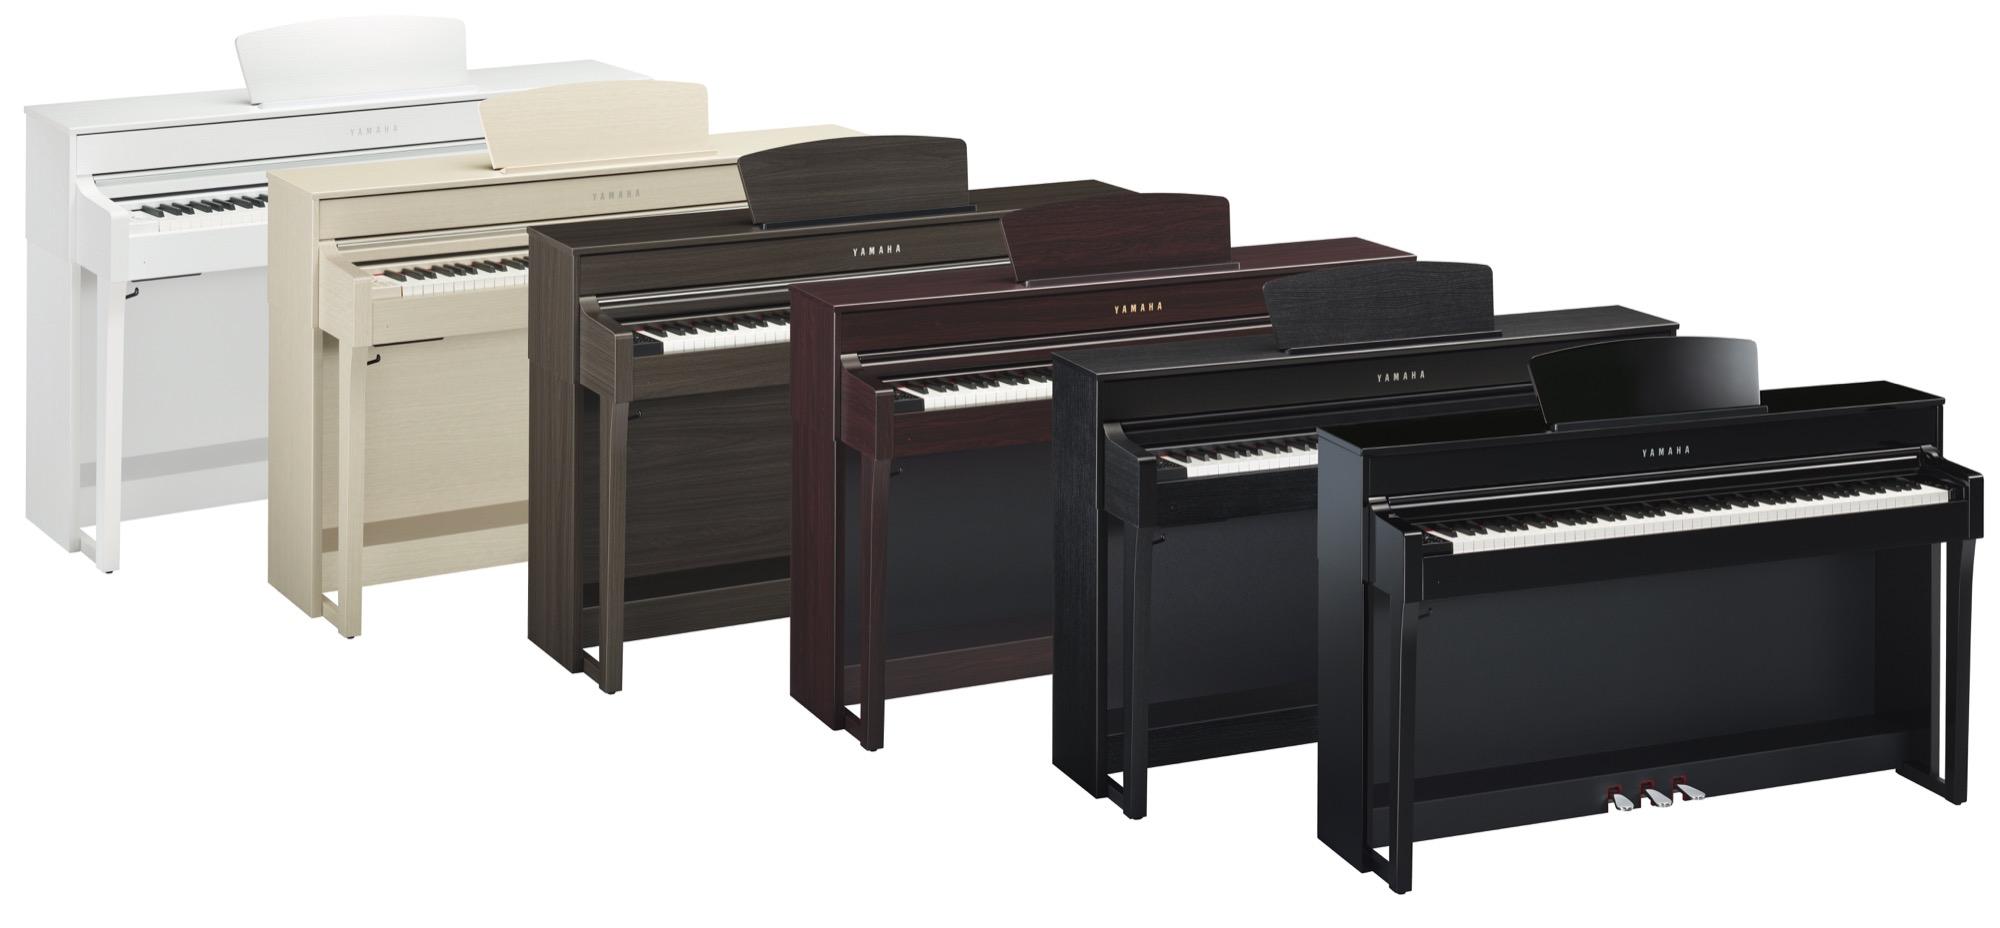 yamaha clp 635 clavinova digital piano various colours finishes available yamaha music london. Black Bedroom Furniture Sets. Home Design Ideas